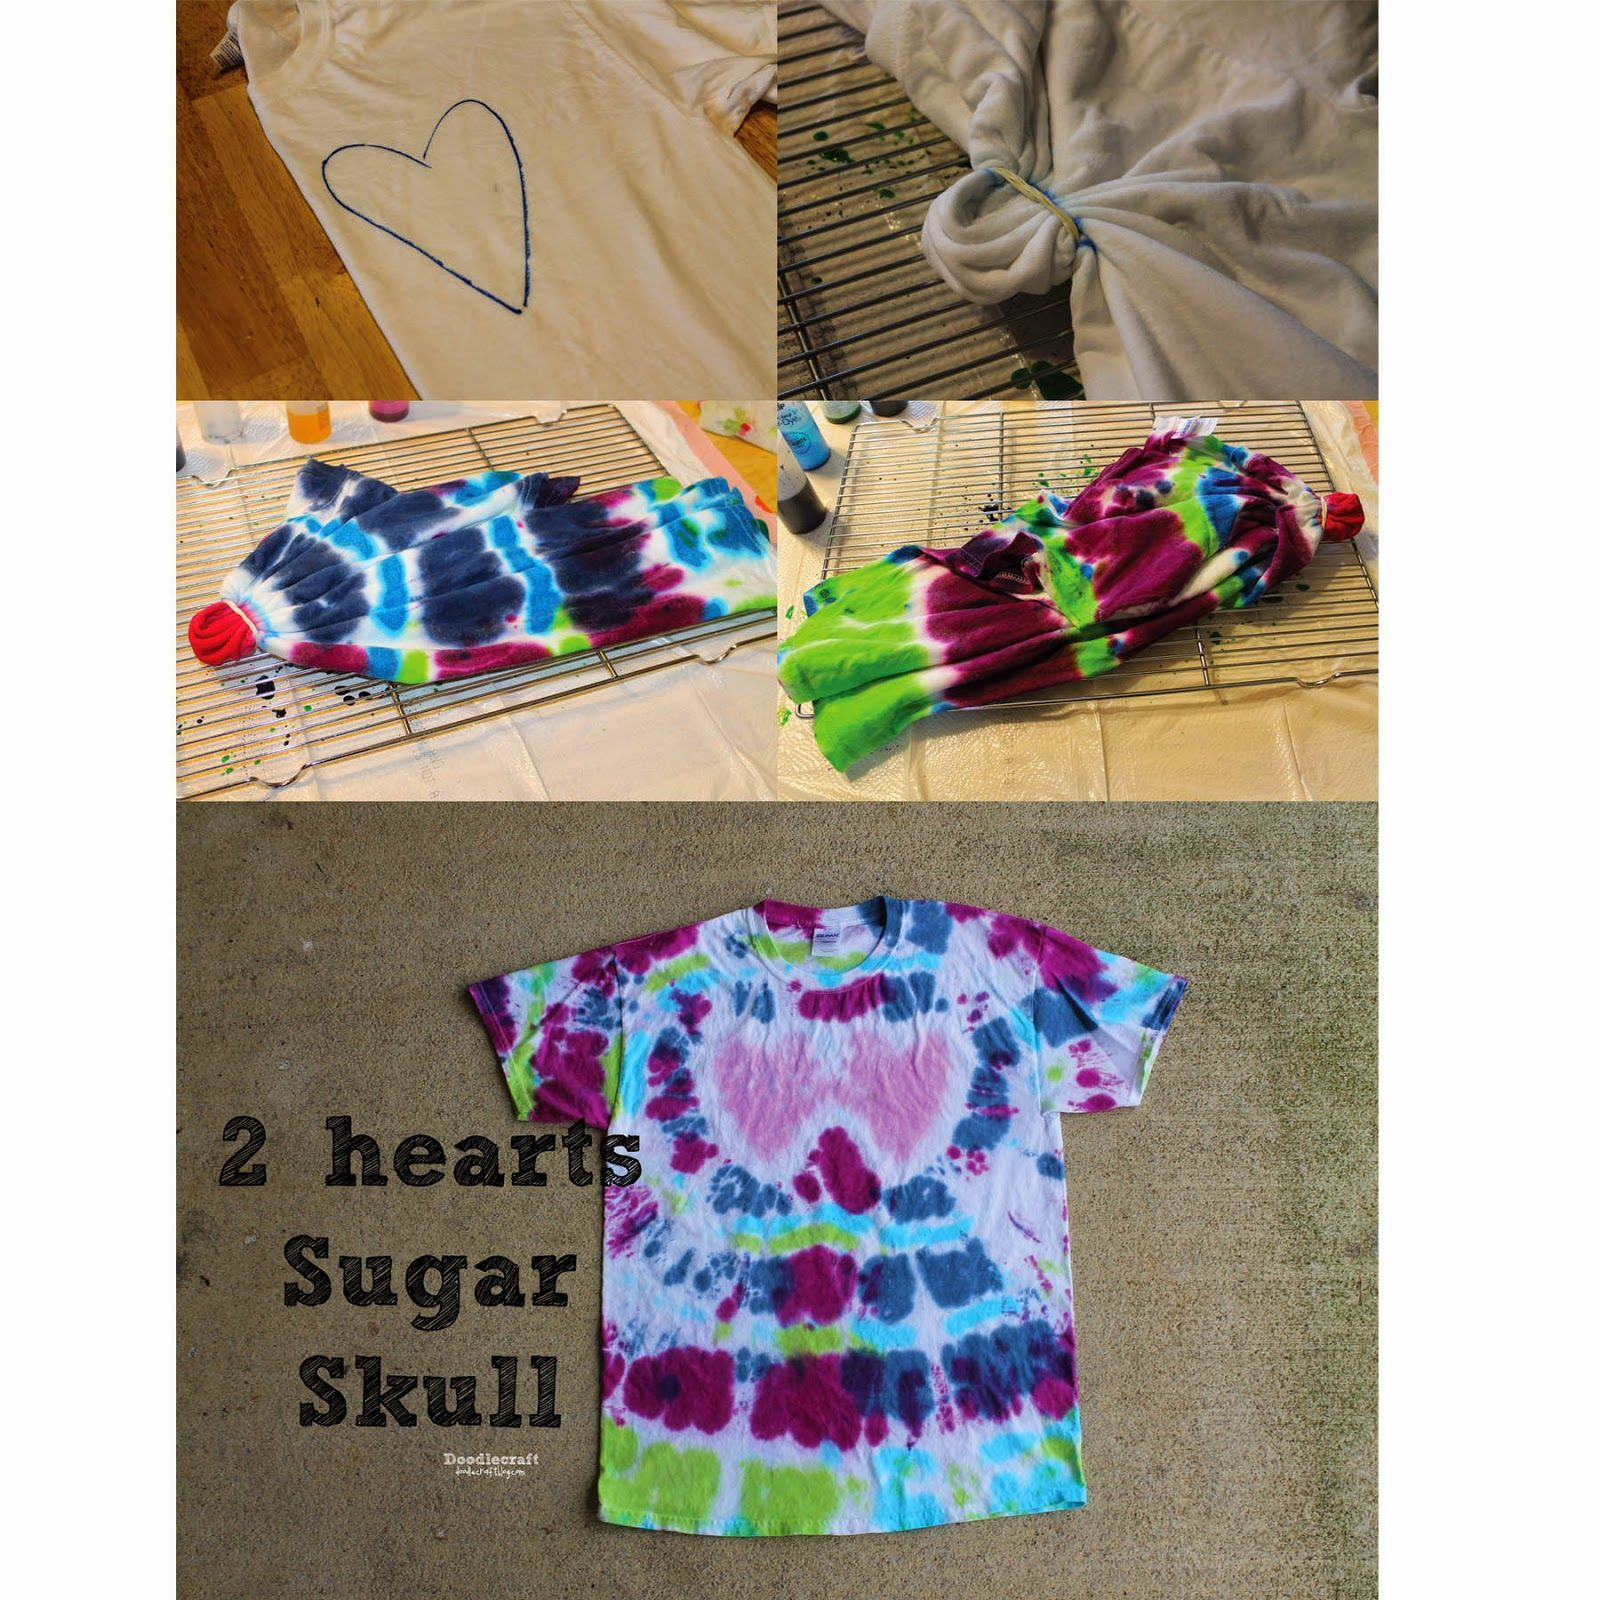 cbe9d0c718fe Diy Tie Dye Shirts Pinterest - BCD Tofu House